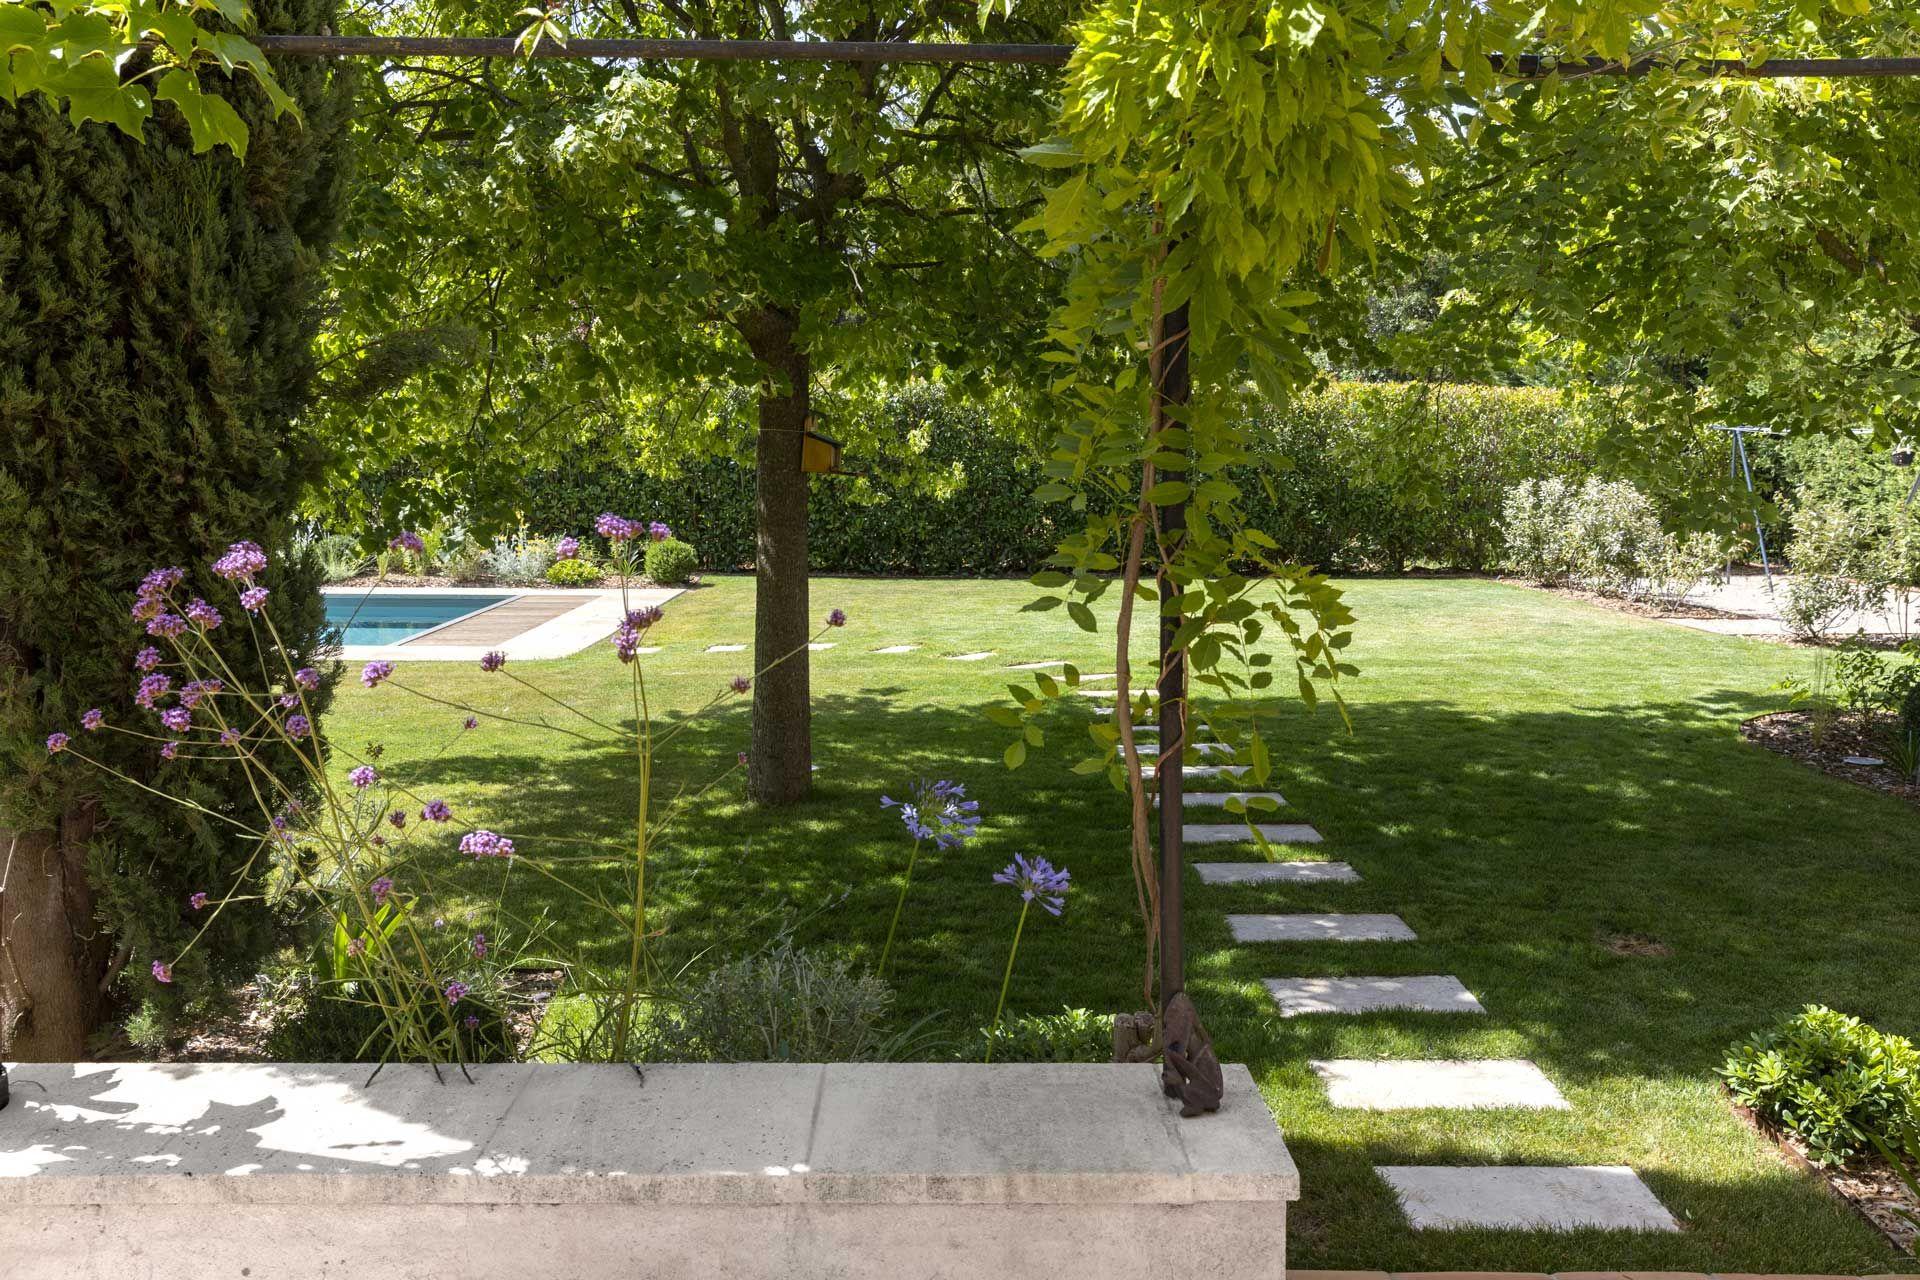 Mettre Piscine Sur Terrain En Pente transformer un jardin monotone en un espace accueillant et